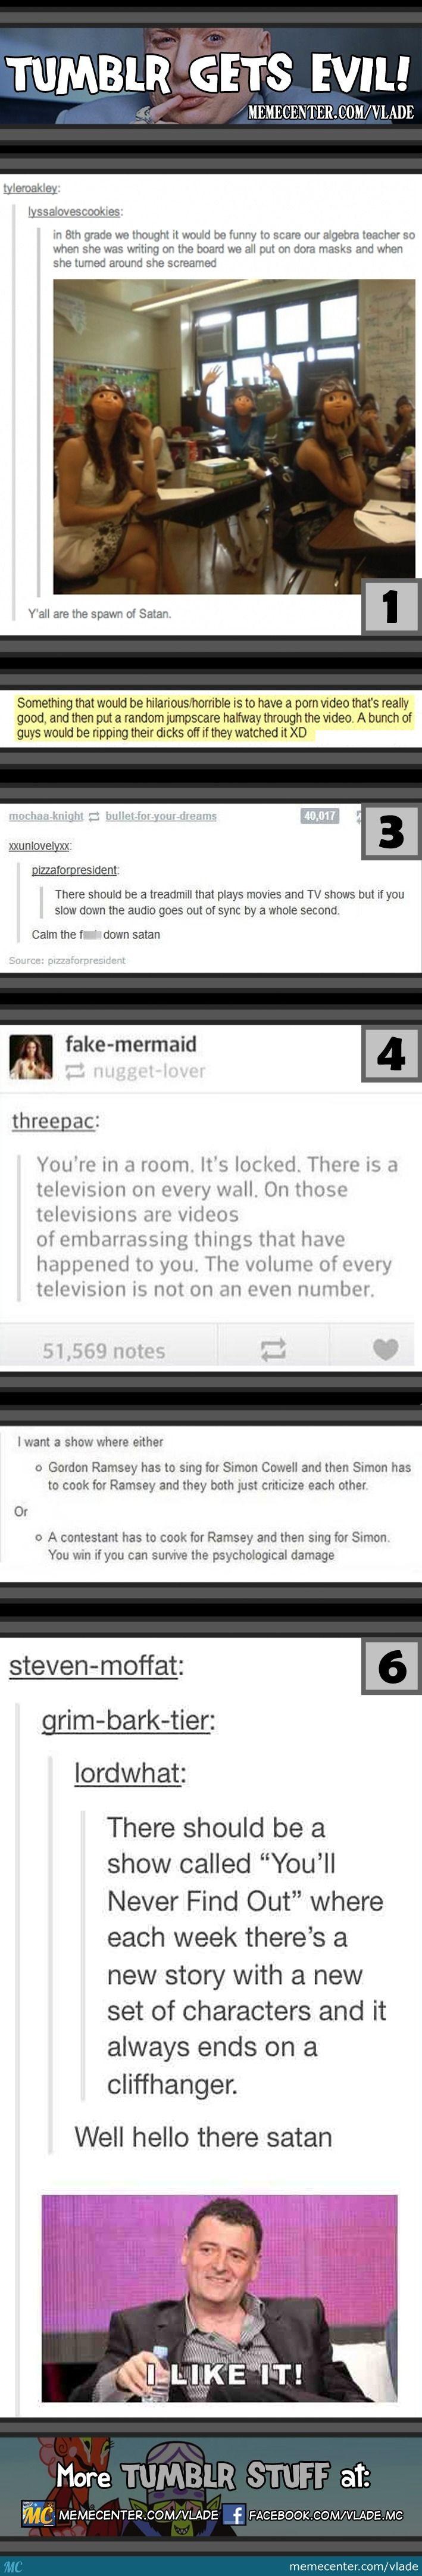 Tumblr Gets Evil!